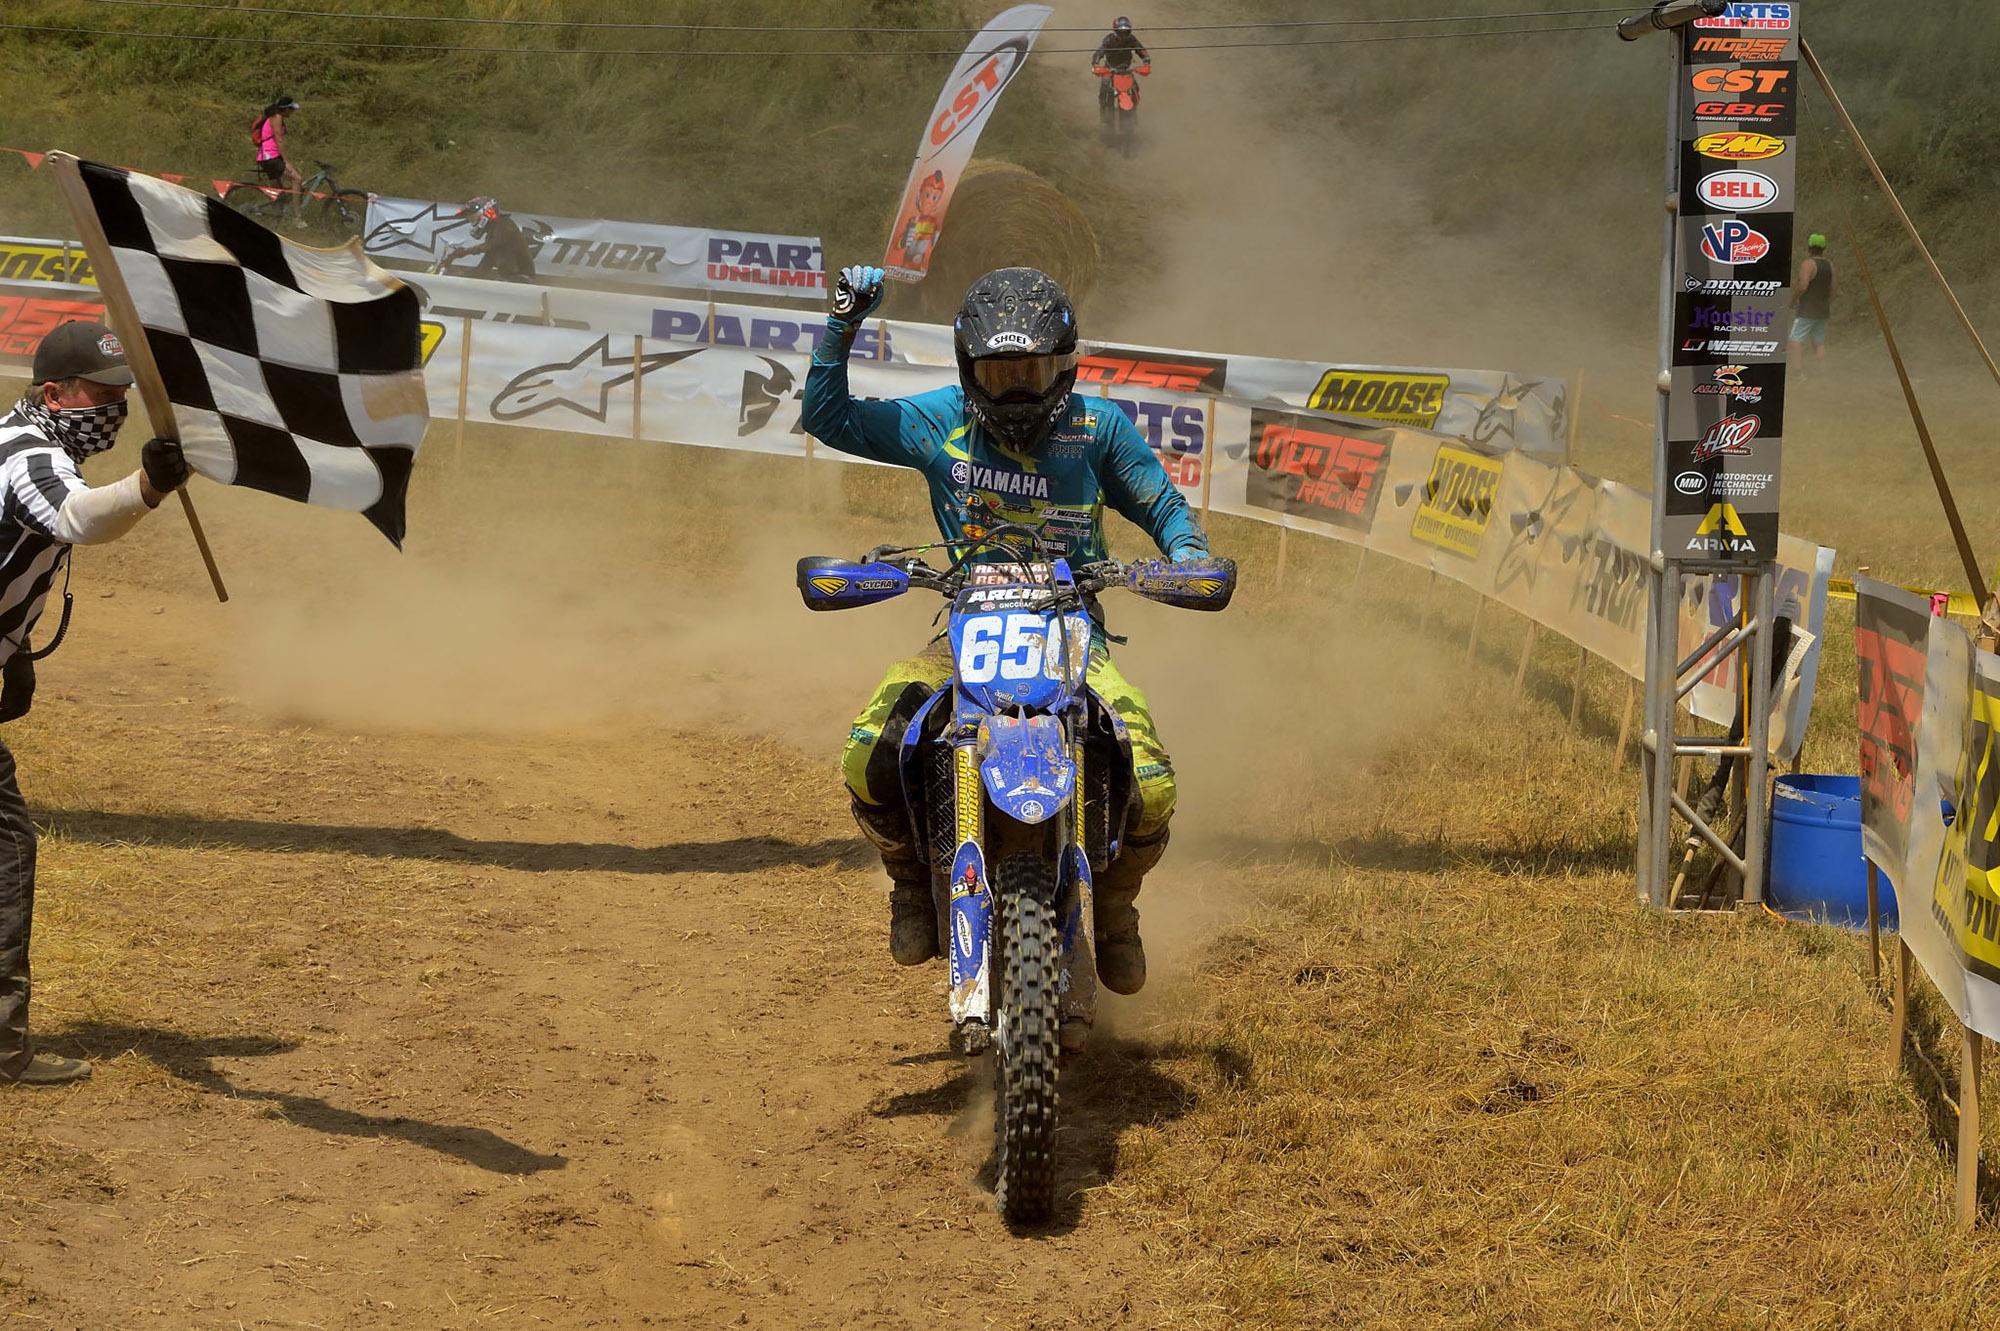 200723 AmPro Yamaha race team's Rachael Archer